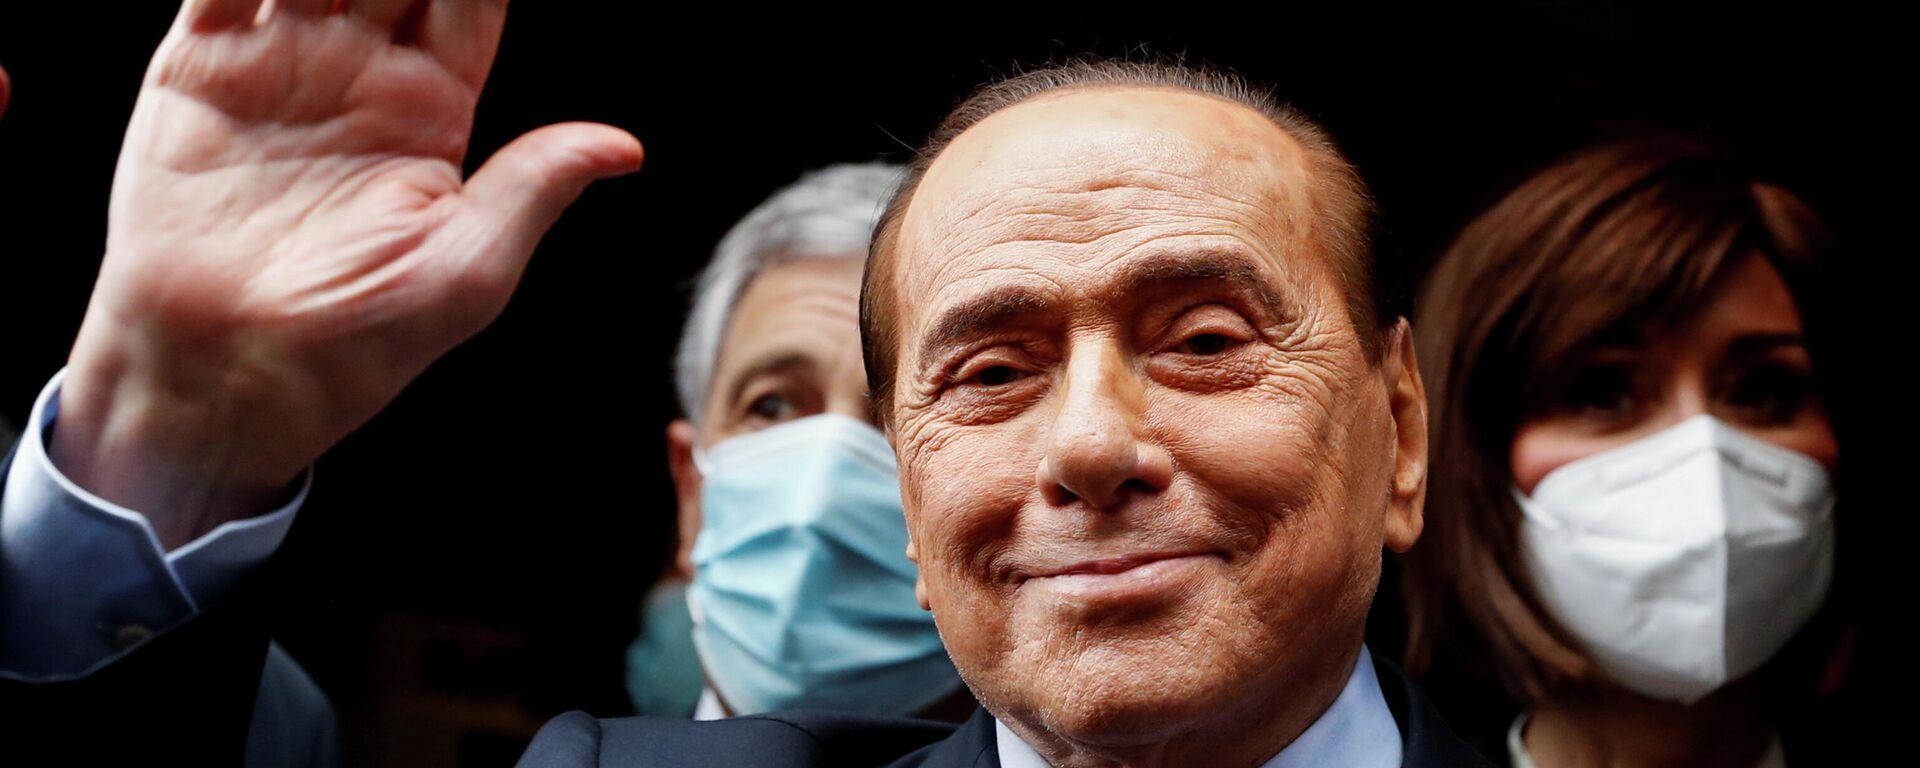 Silvio Berlusconi, ex primer ministro de Italia - Sputnik Mundo, 1920, 27.05.2021